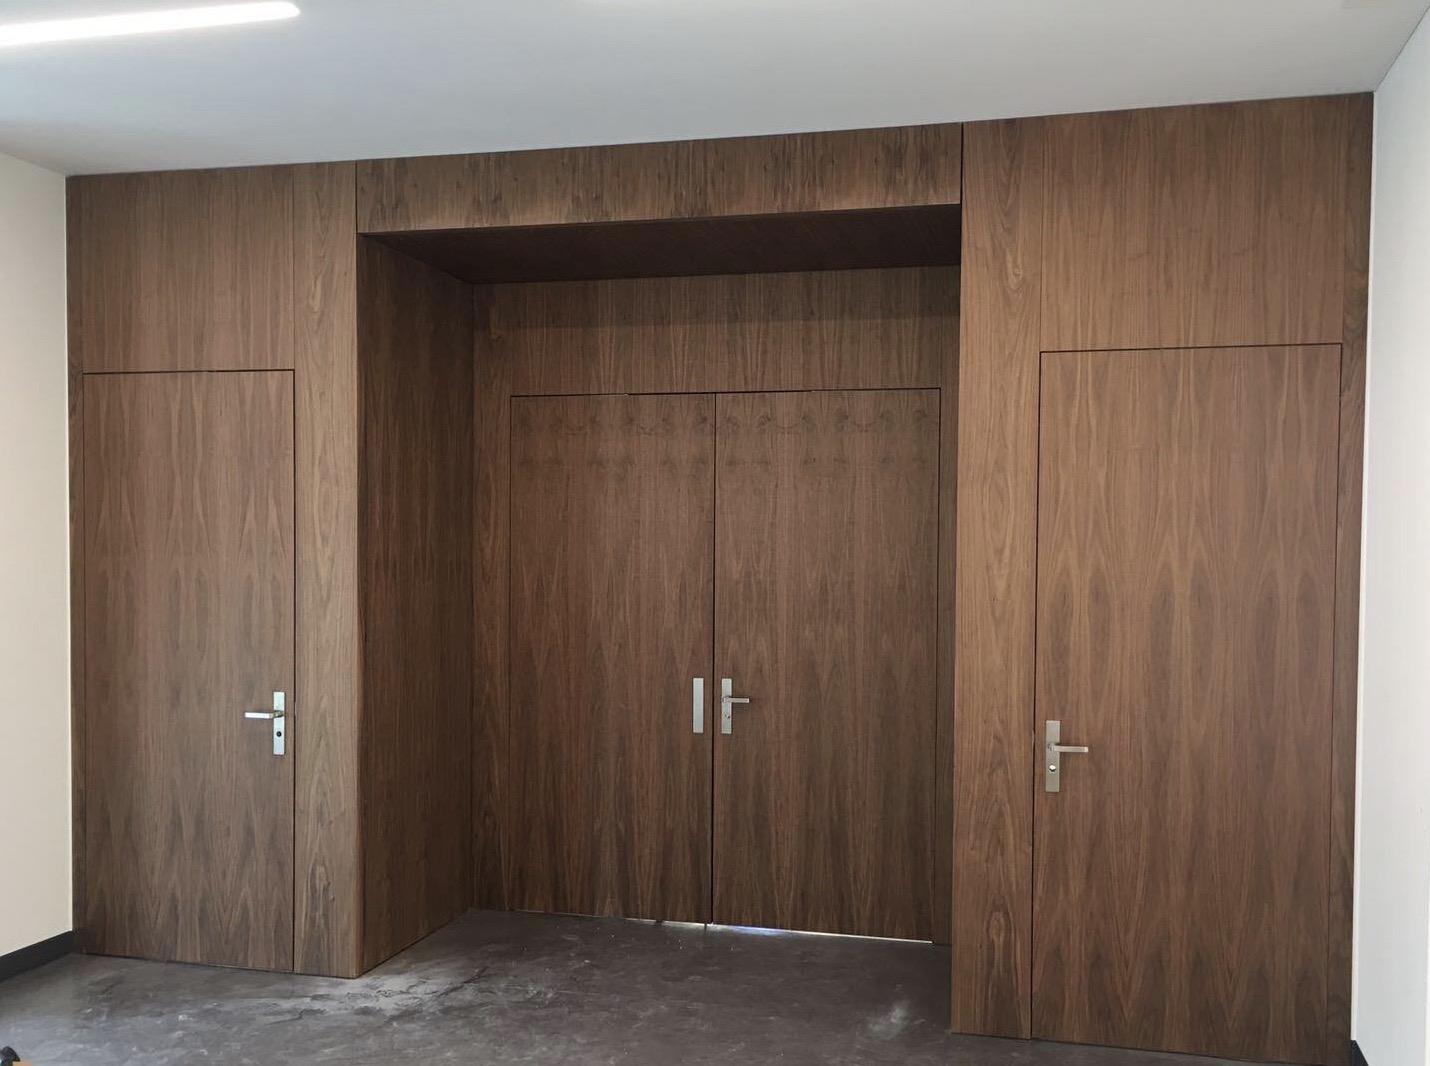 Holz Haustüren